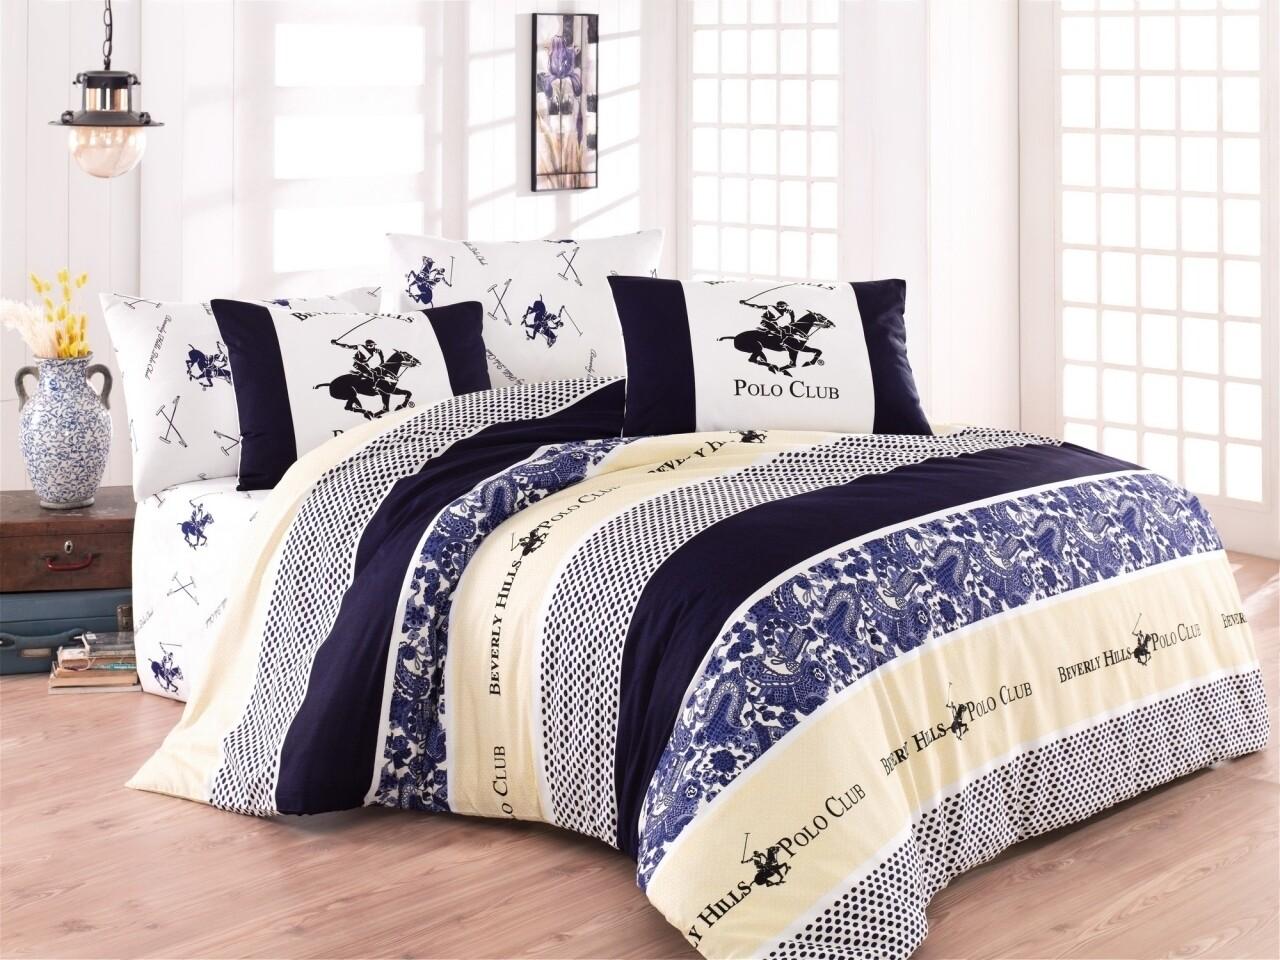 Lenjerie de pat pentru o pesoana, Dark Blue, Beverly Hills Polo Club, 3 piese, 160 x 240 cm, 100% bumbac ranforce, multicolora